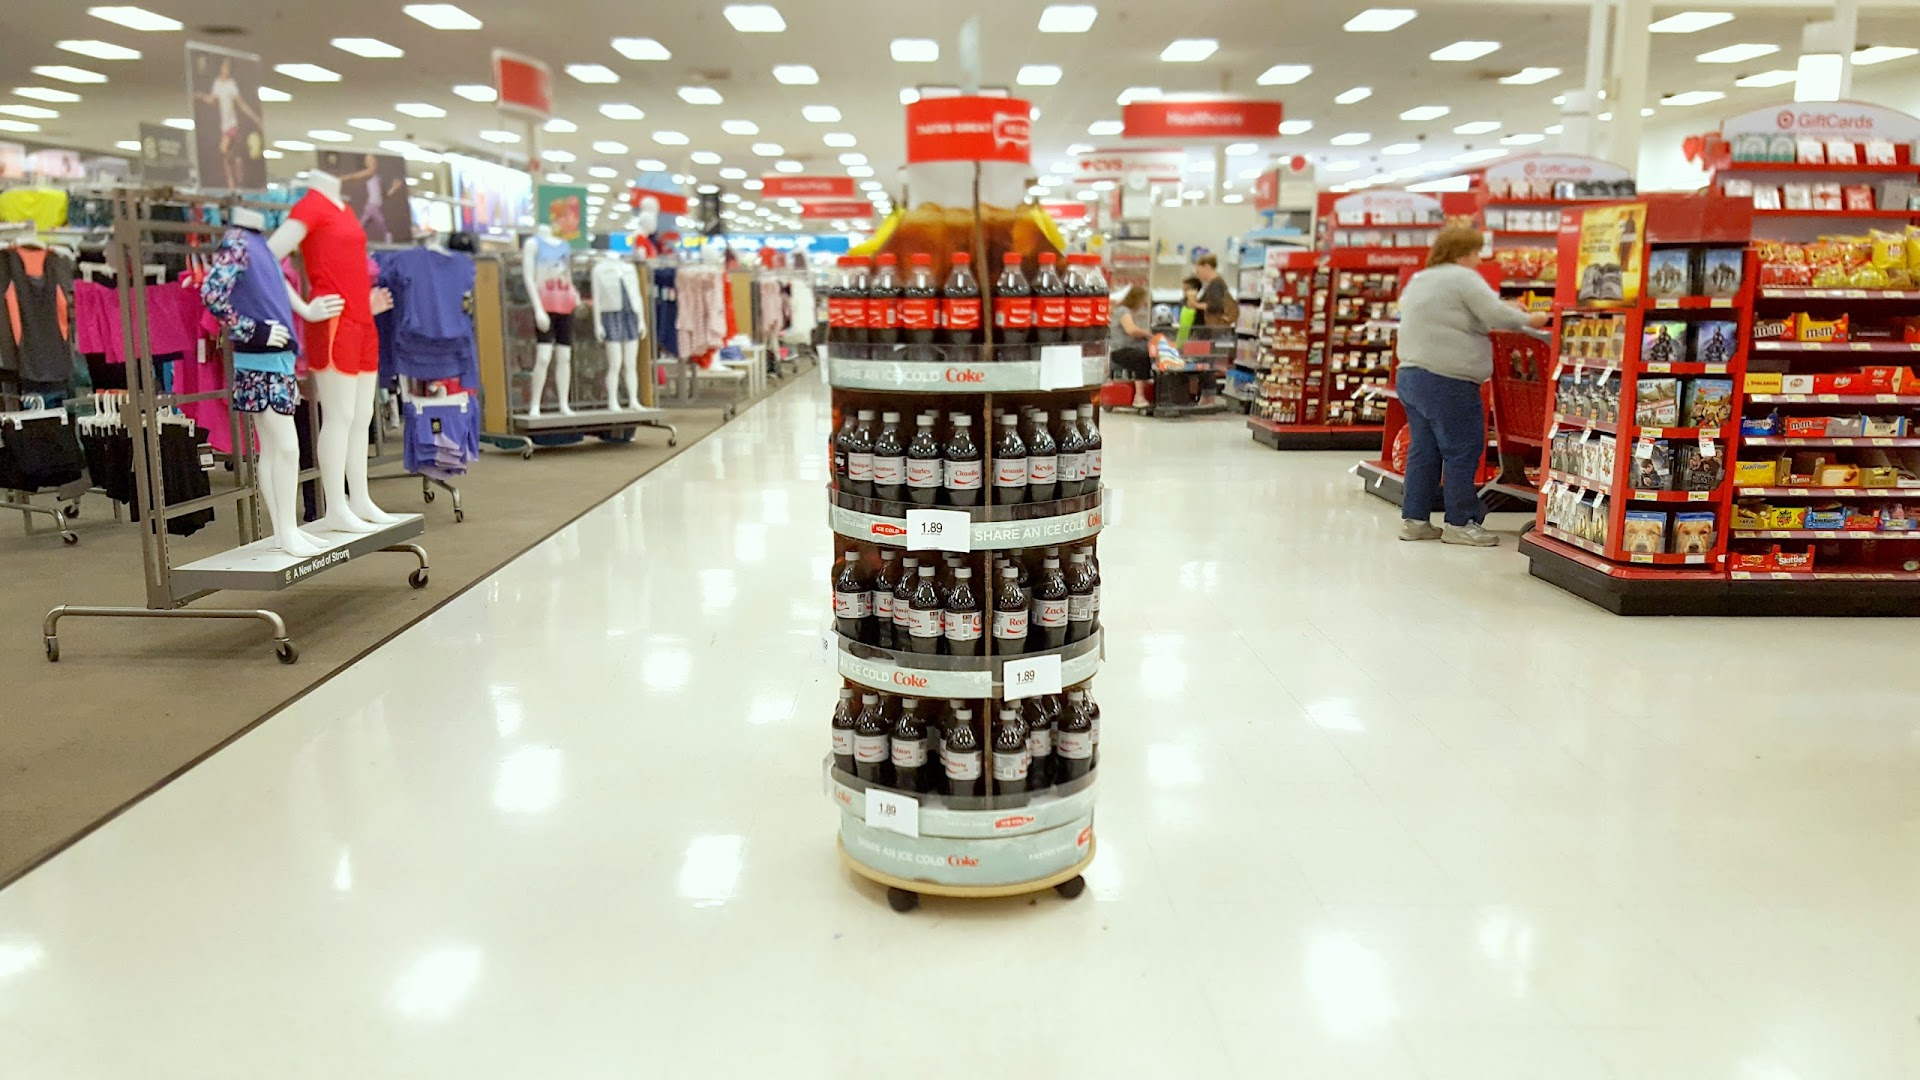 diet coke, coca-cola, target, display